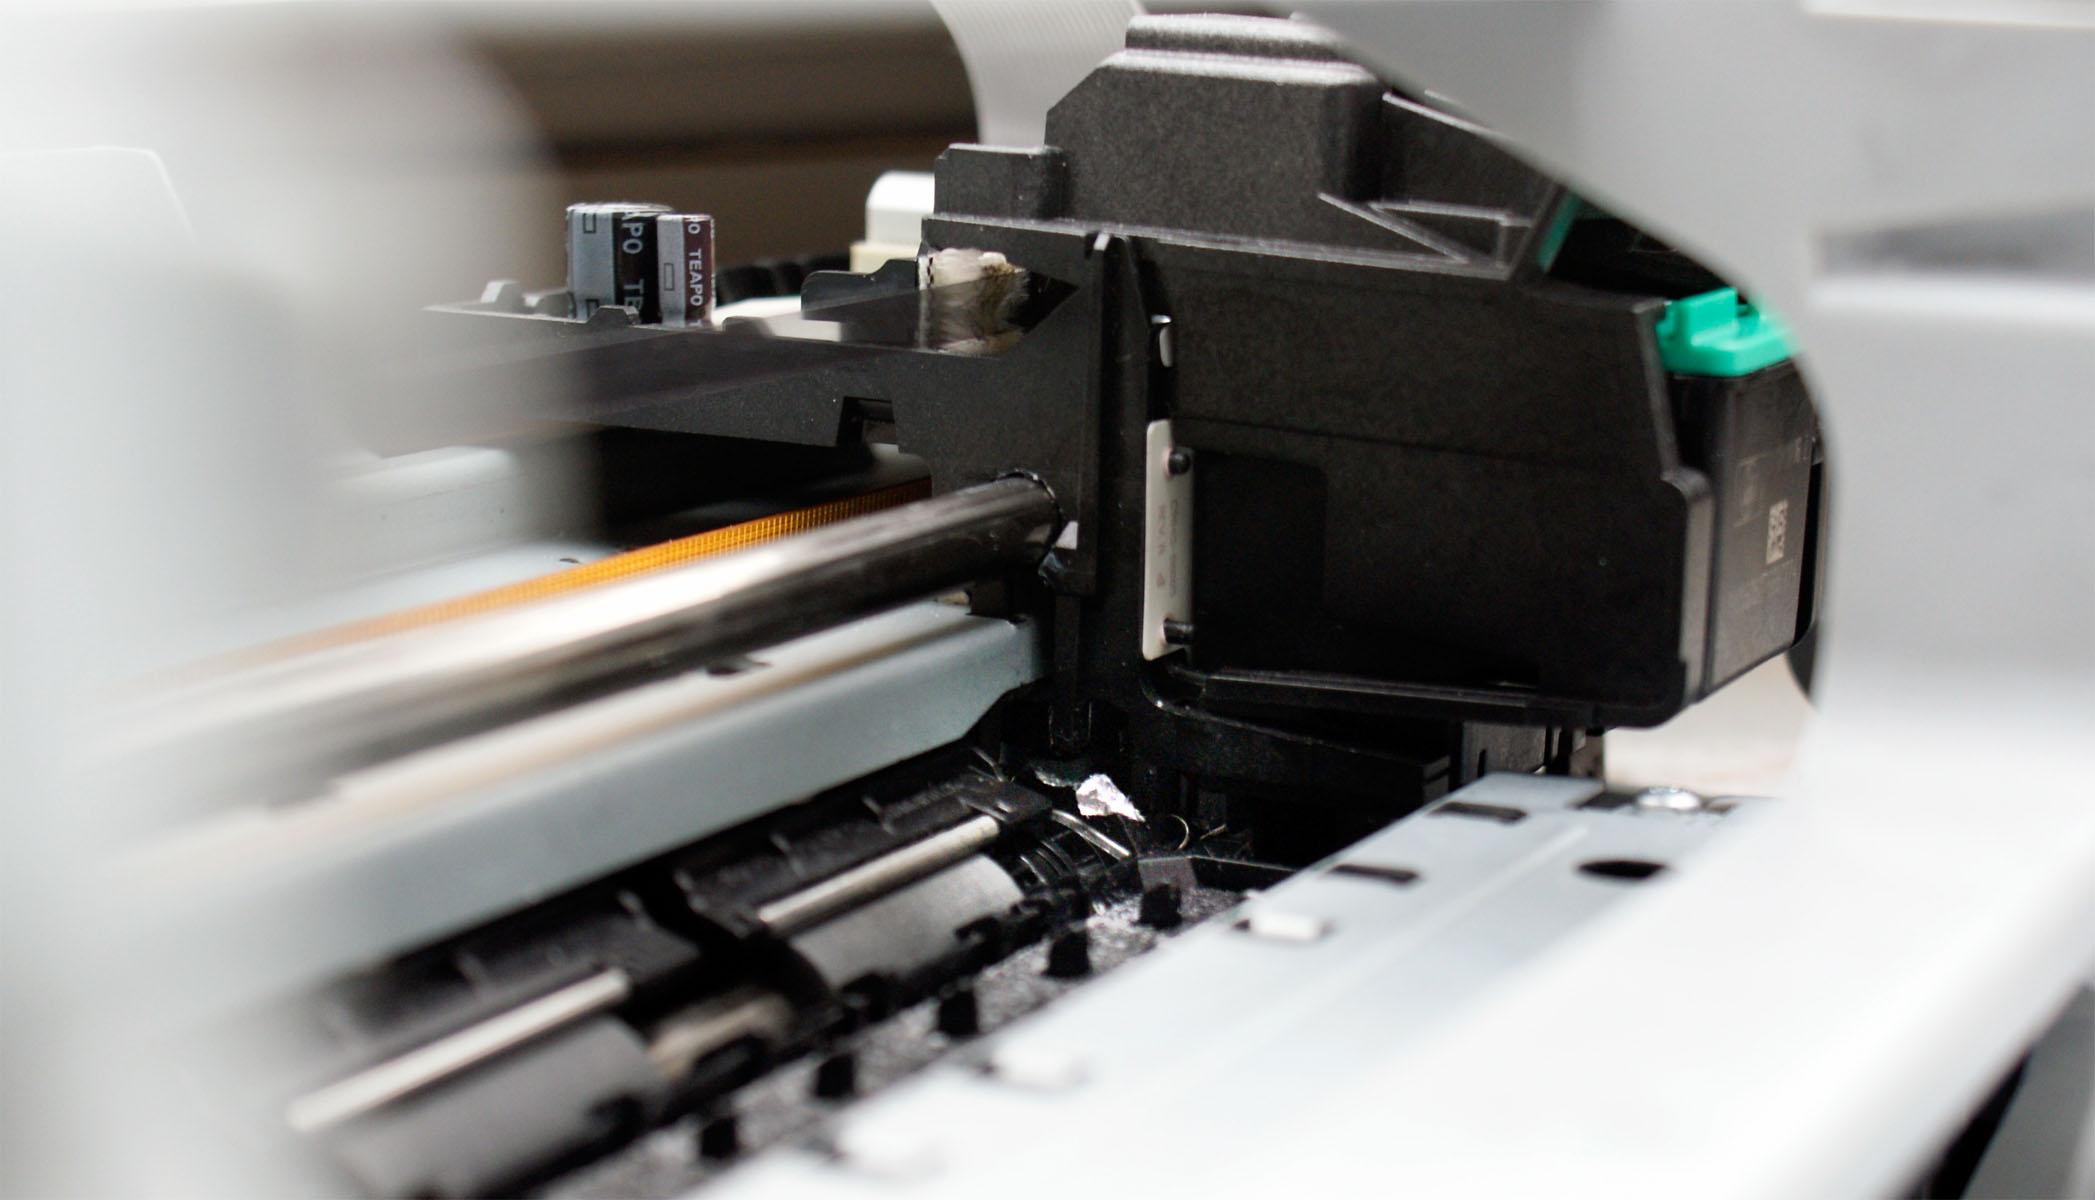 HP C4280 - zablokowana karetka - ulamany kawalek plastiku.